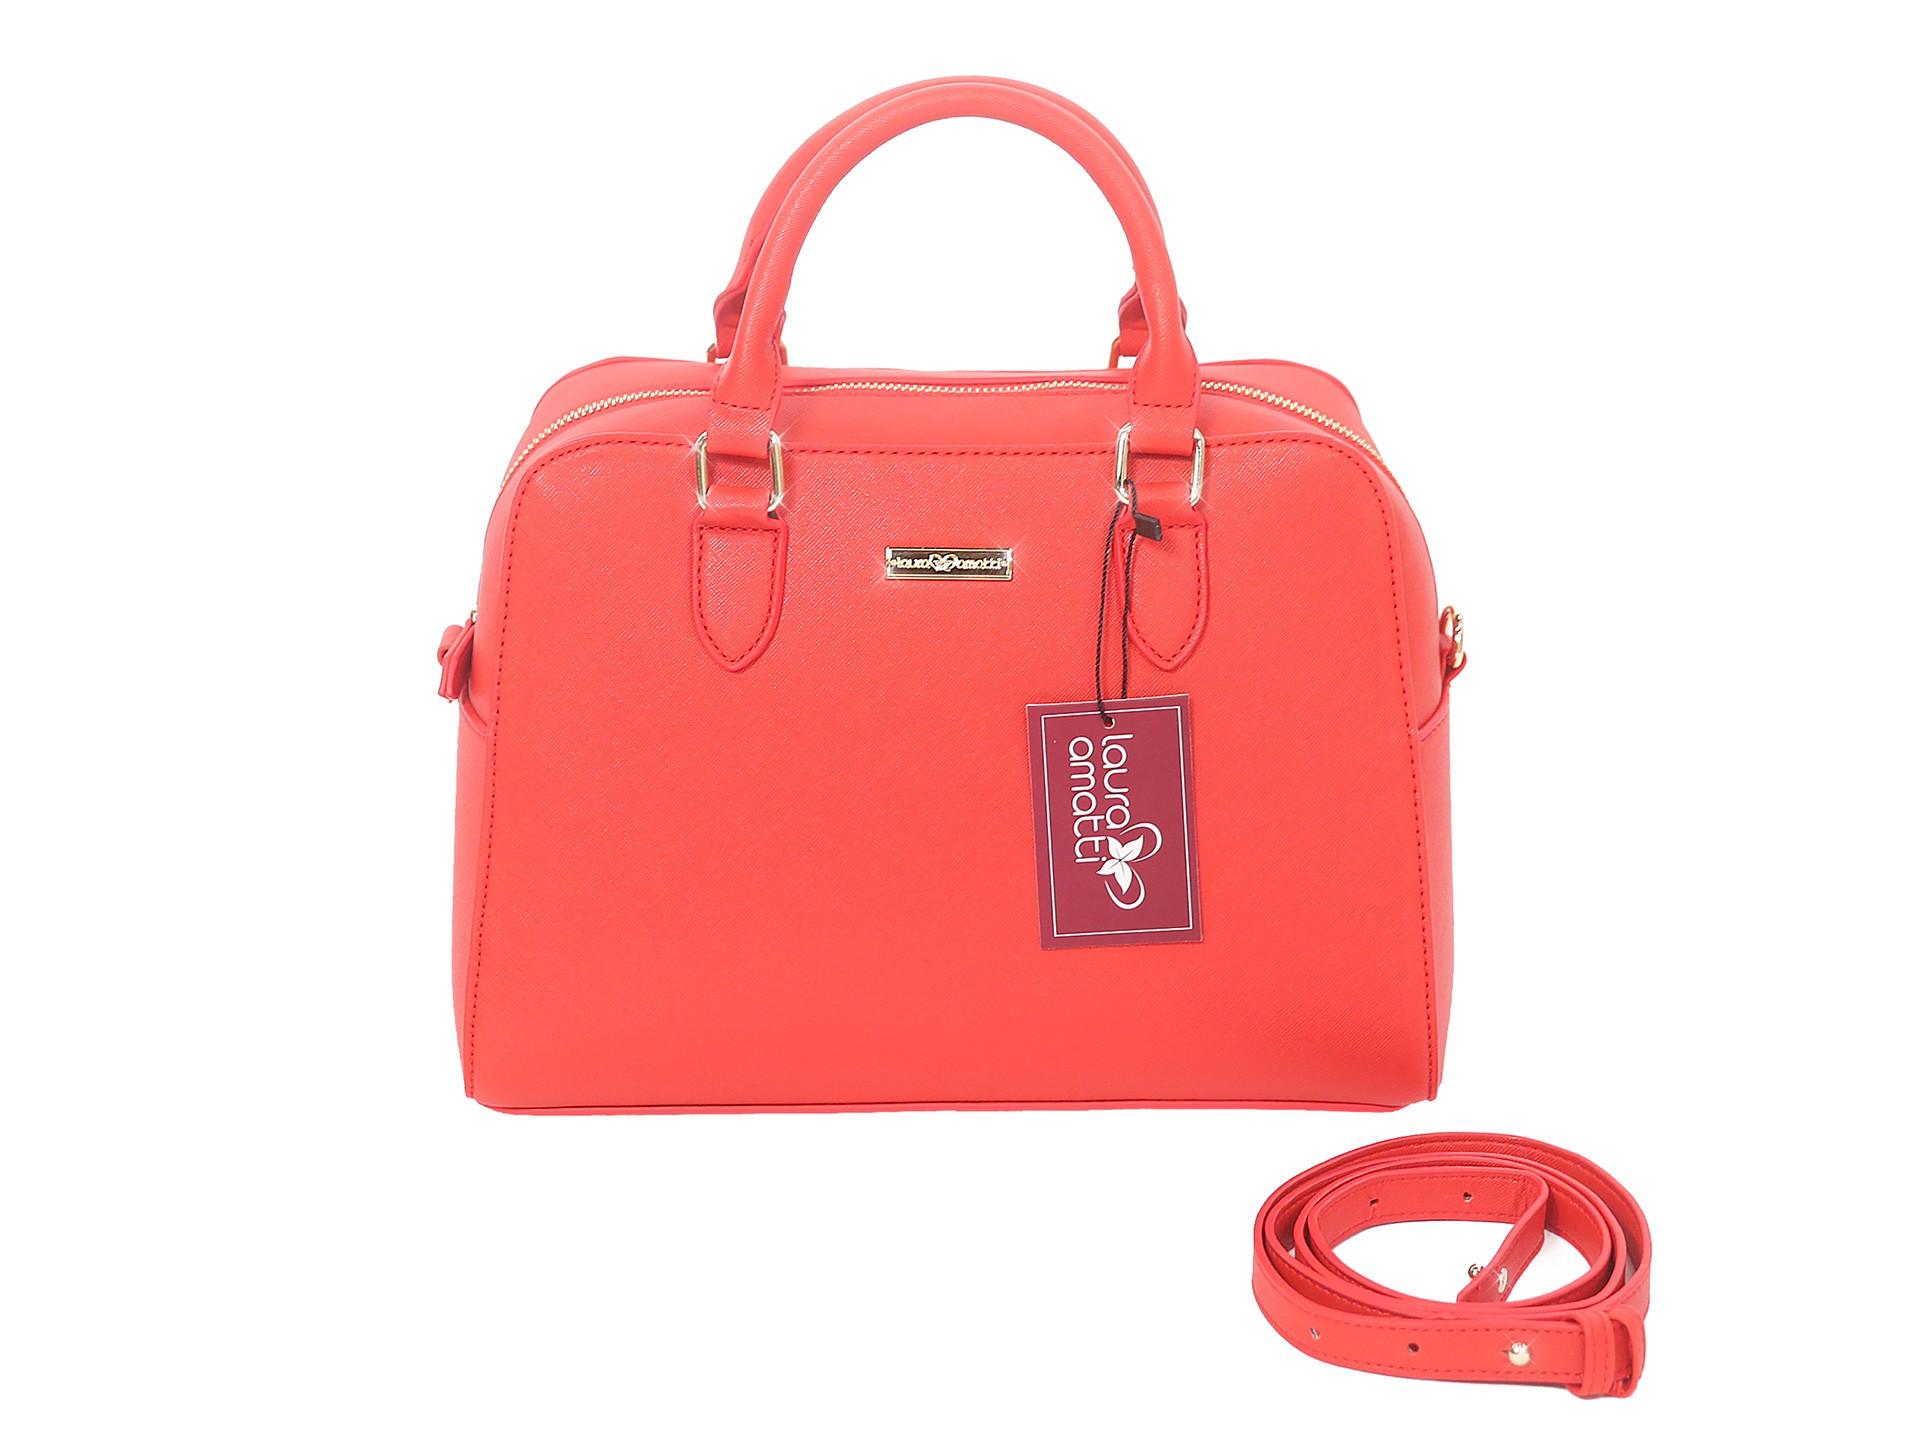 Miss Gorgeous táska - Laura Amatti 4fa3f385c3